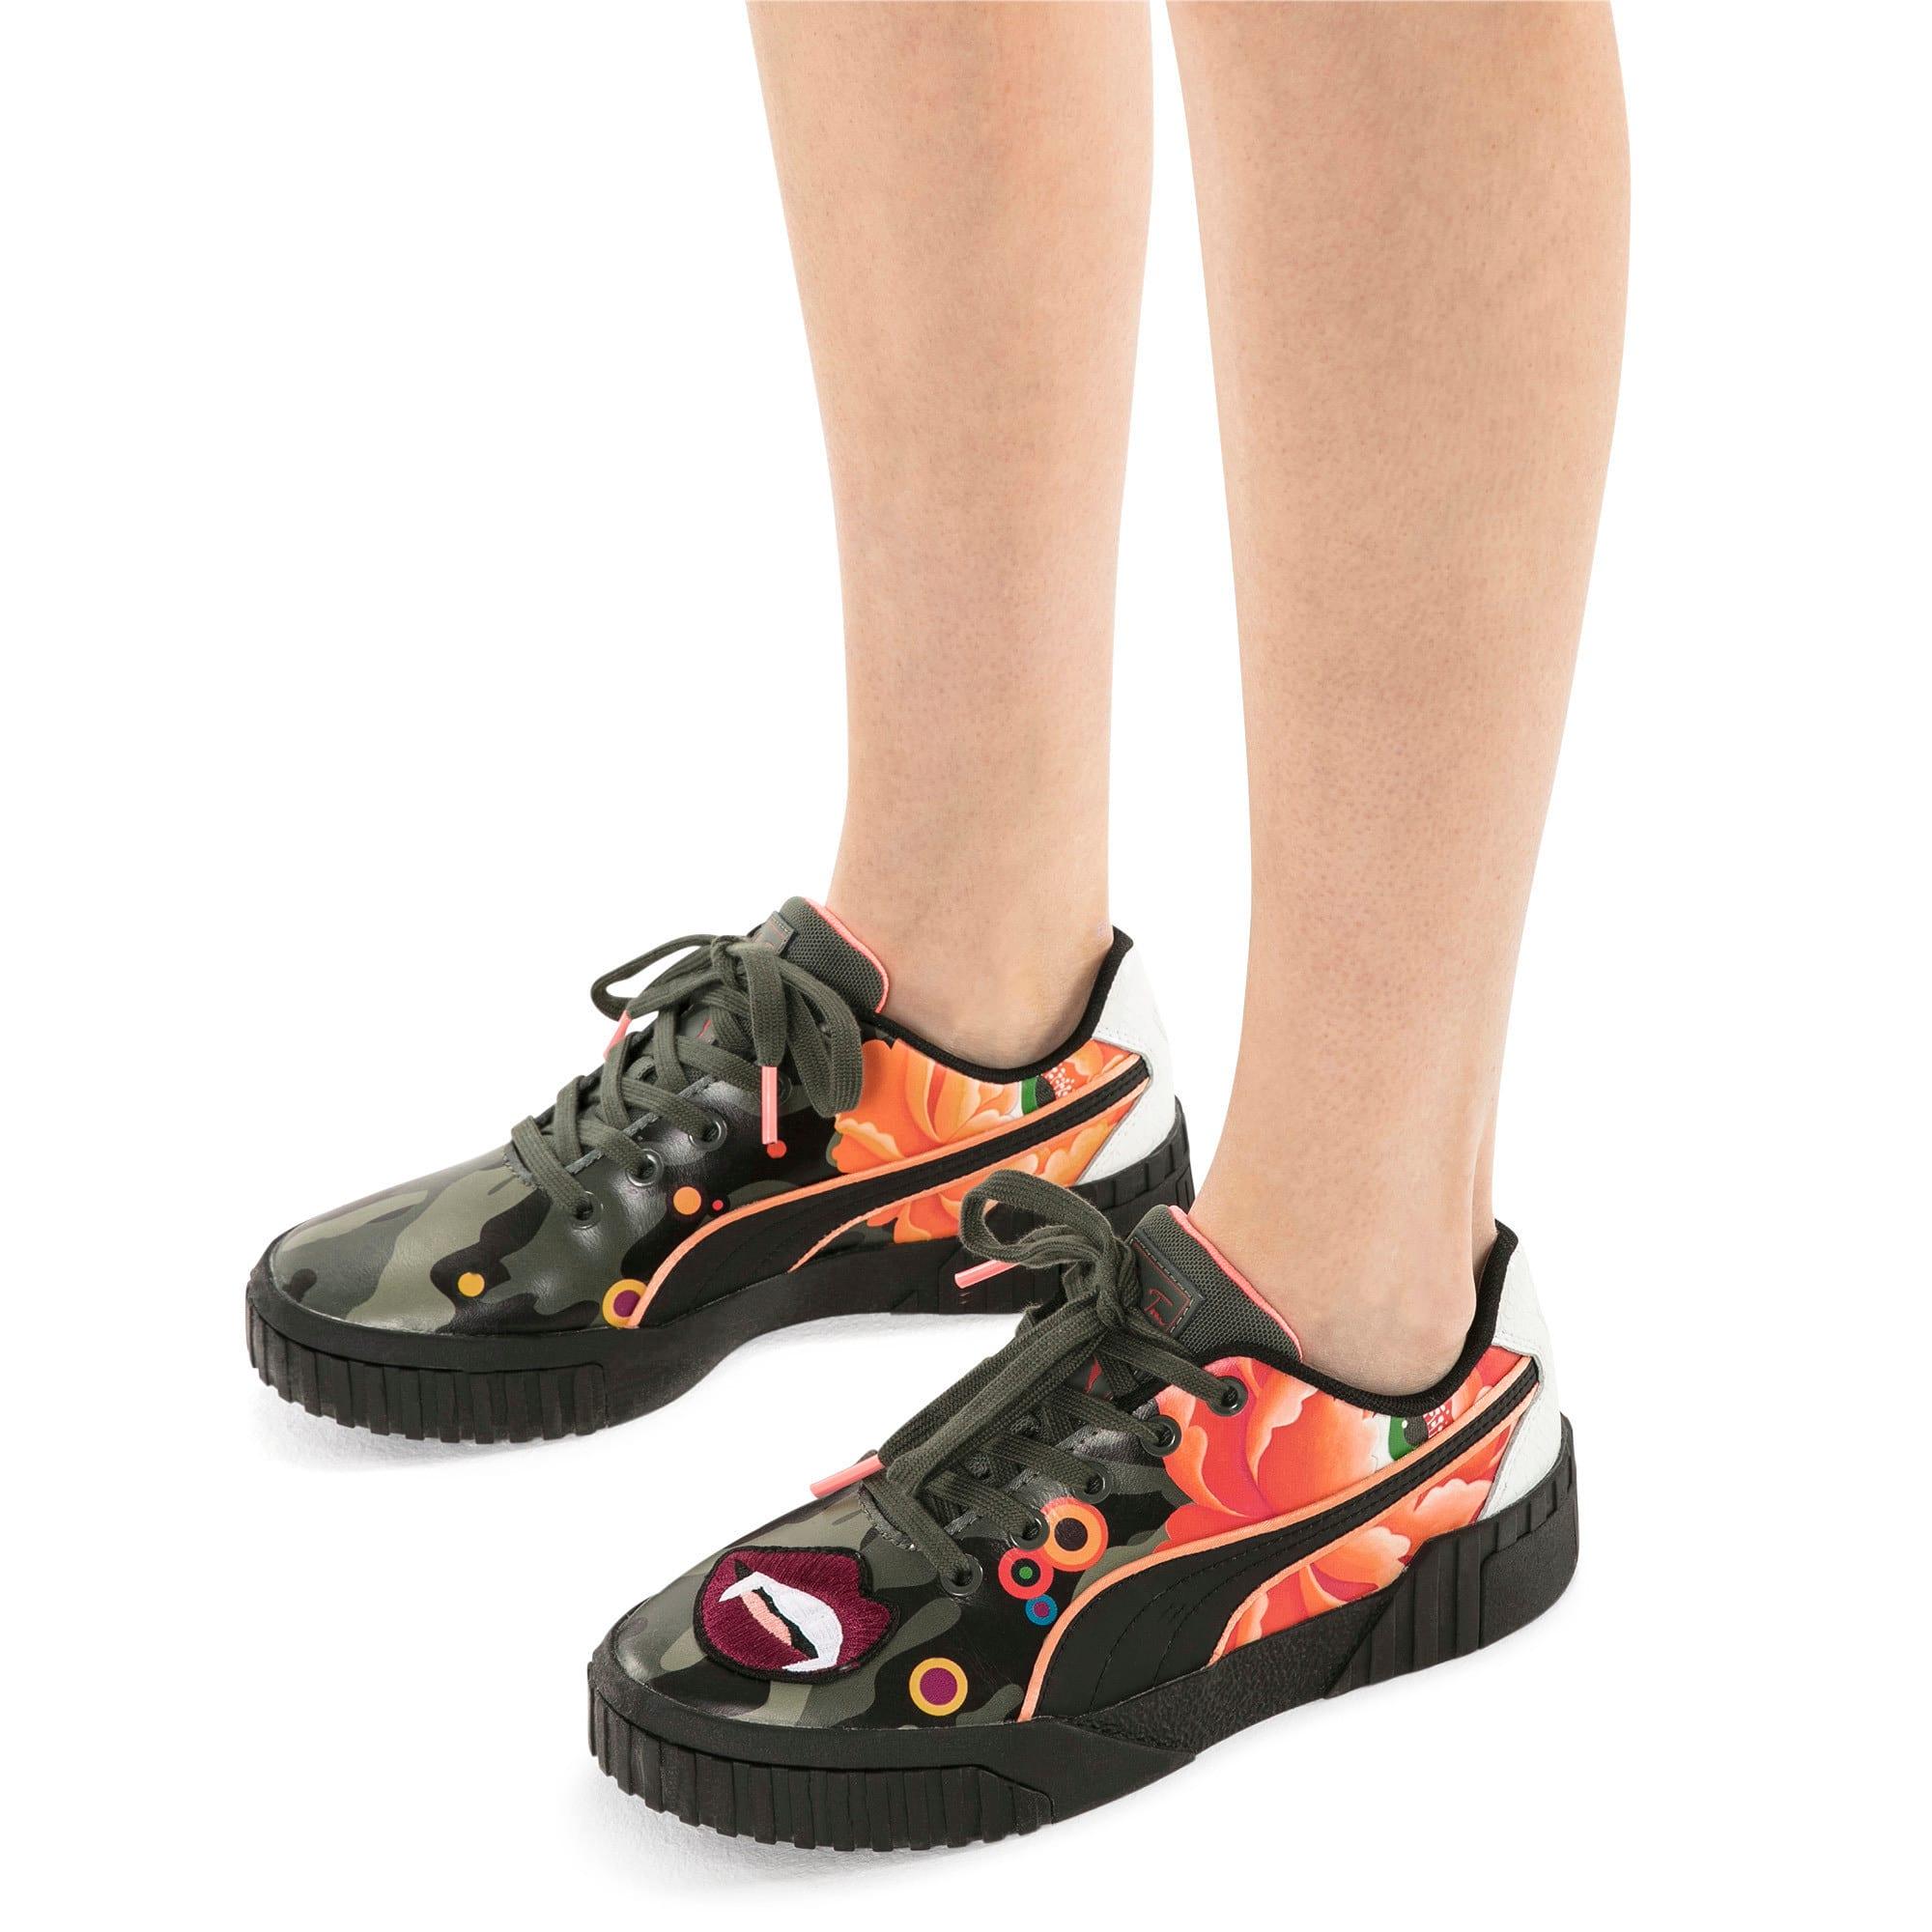 Thumbnail 2 of PUMA x SUE TSAI Cali 'Peonies Camo' Women's Sneakers, Puma Black-Puma Black, medium